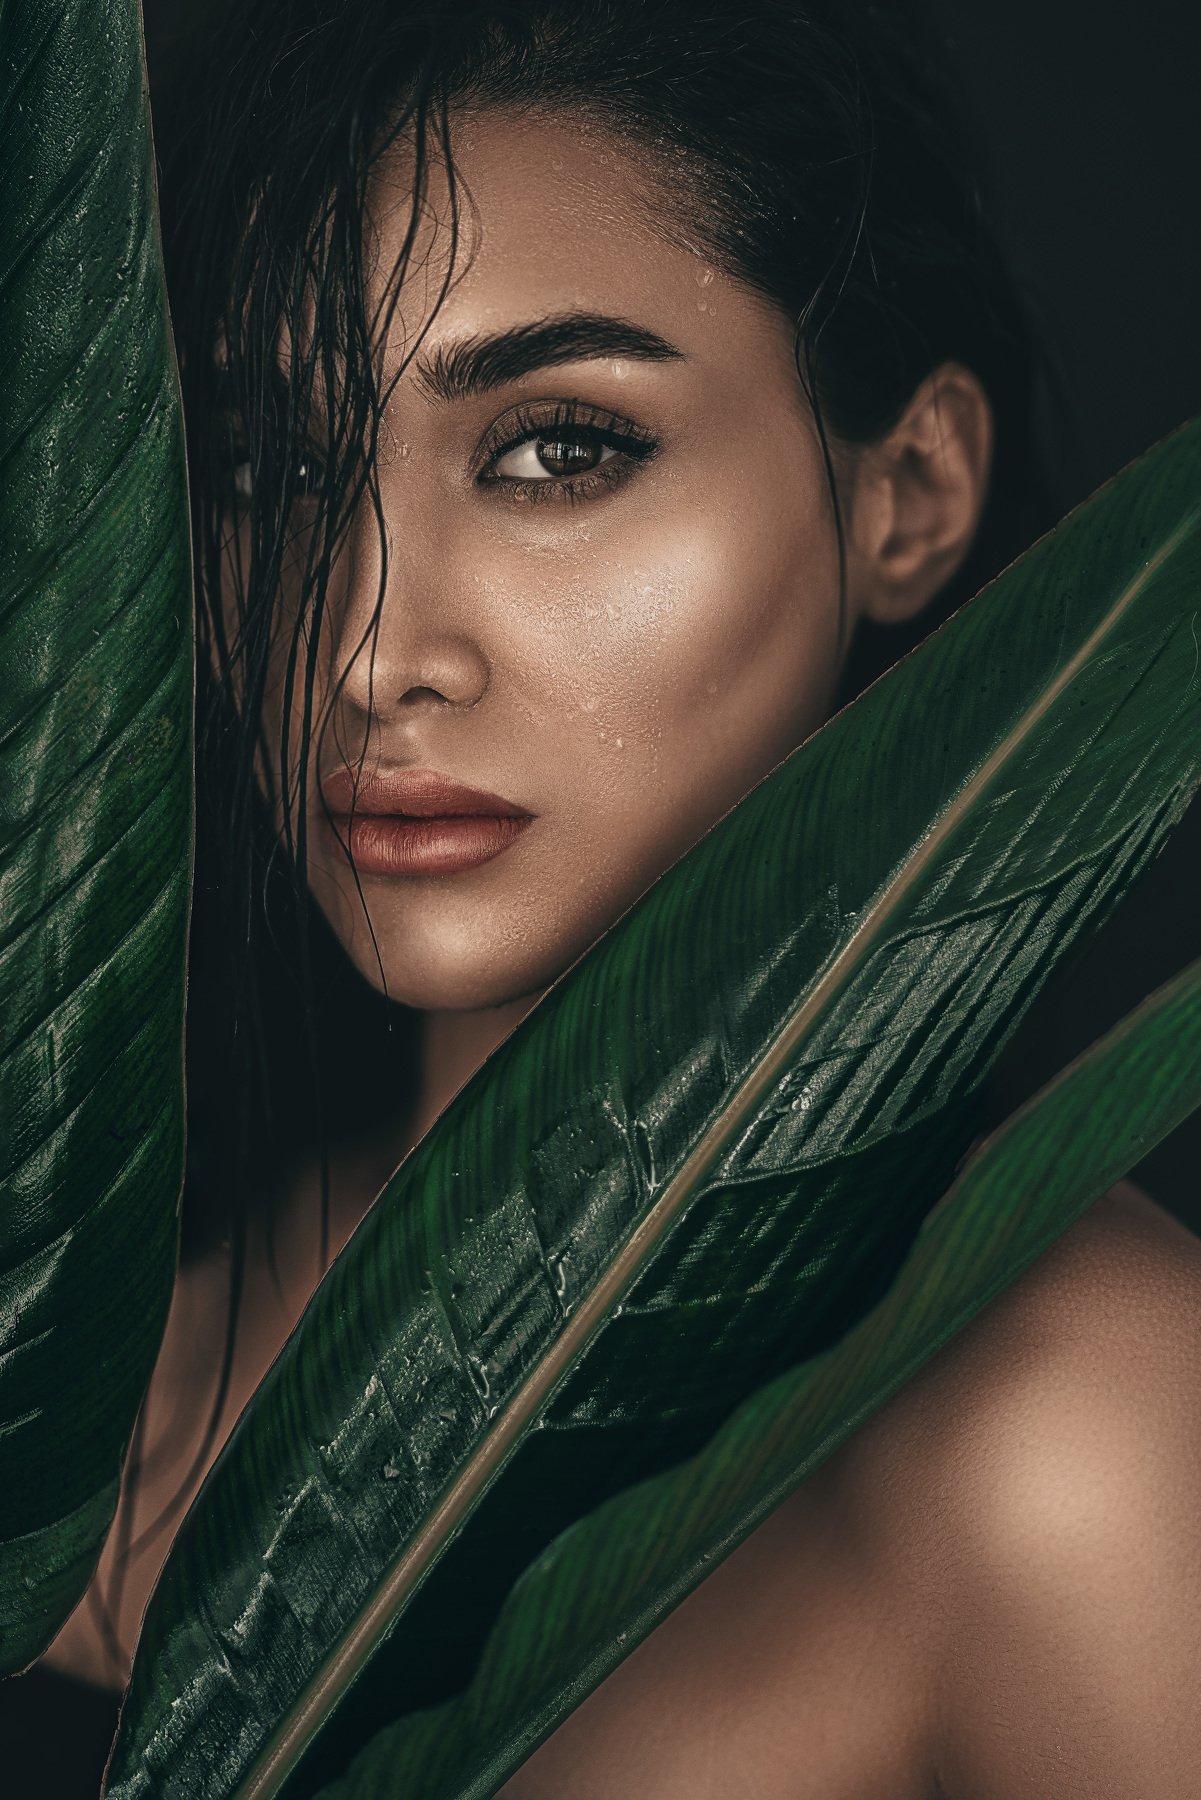 green, hot,leaves,female,girl,fashion,wet, Behzadi Amir